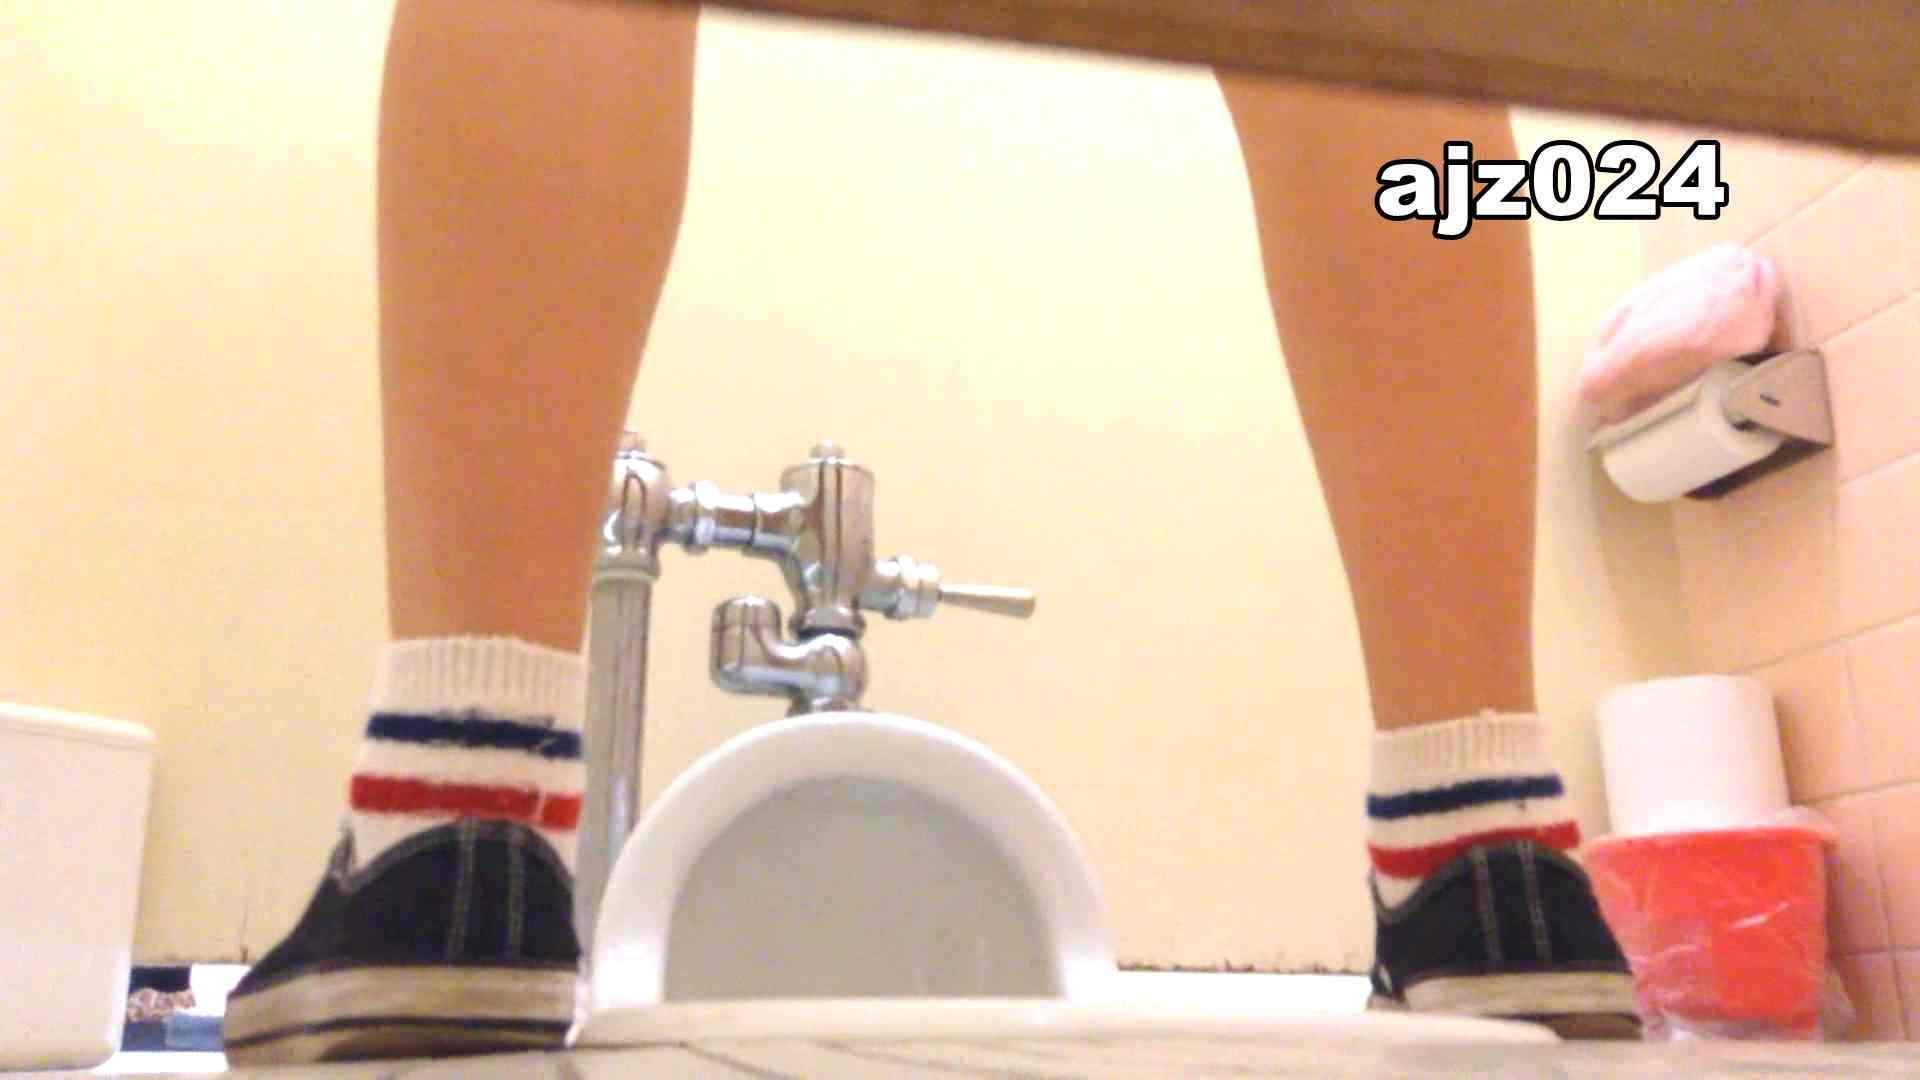 某有名大学女性洗面所 vol.24 OL女体 AV動画キャプチャ 66連発 26